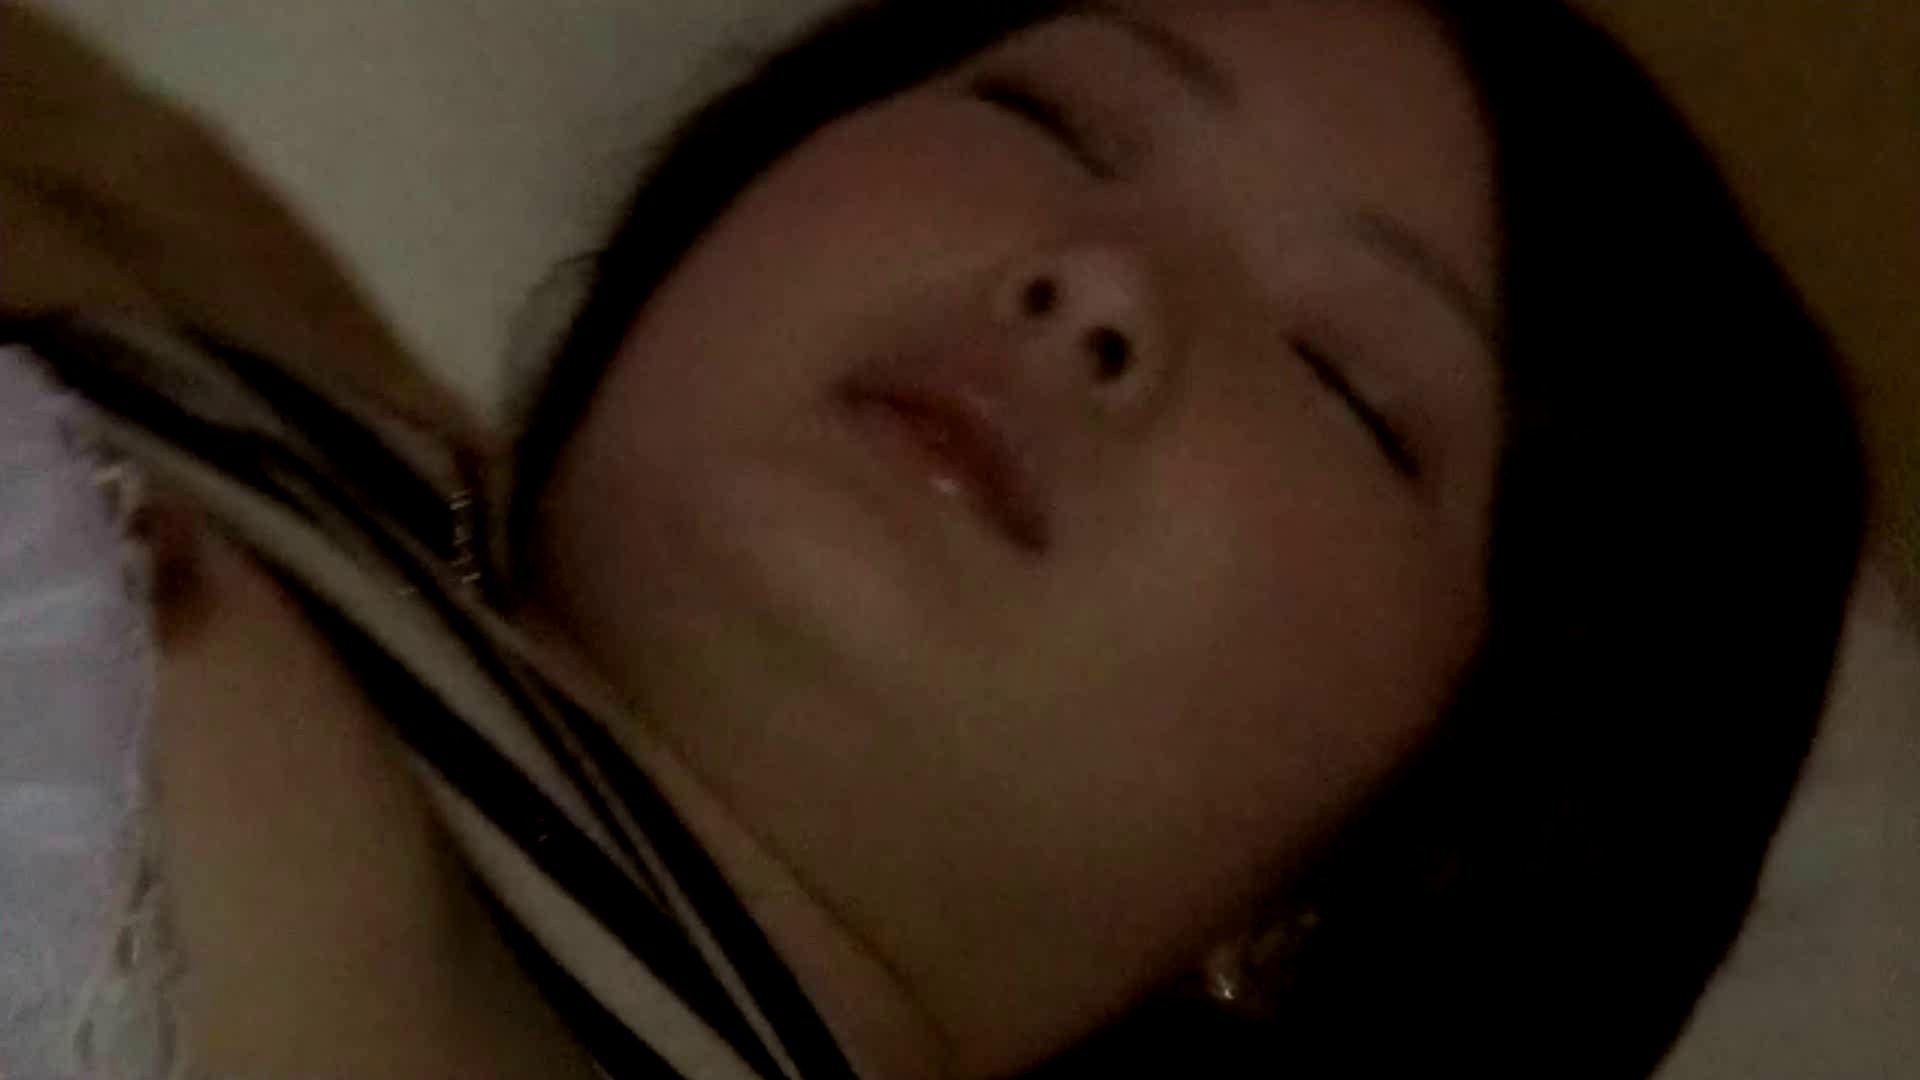 vol.31 【KTちゃん】現役JD居酒屋アルバイト 3回目? 知人 エロ画像 85枚 77